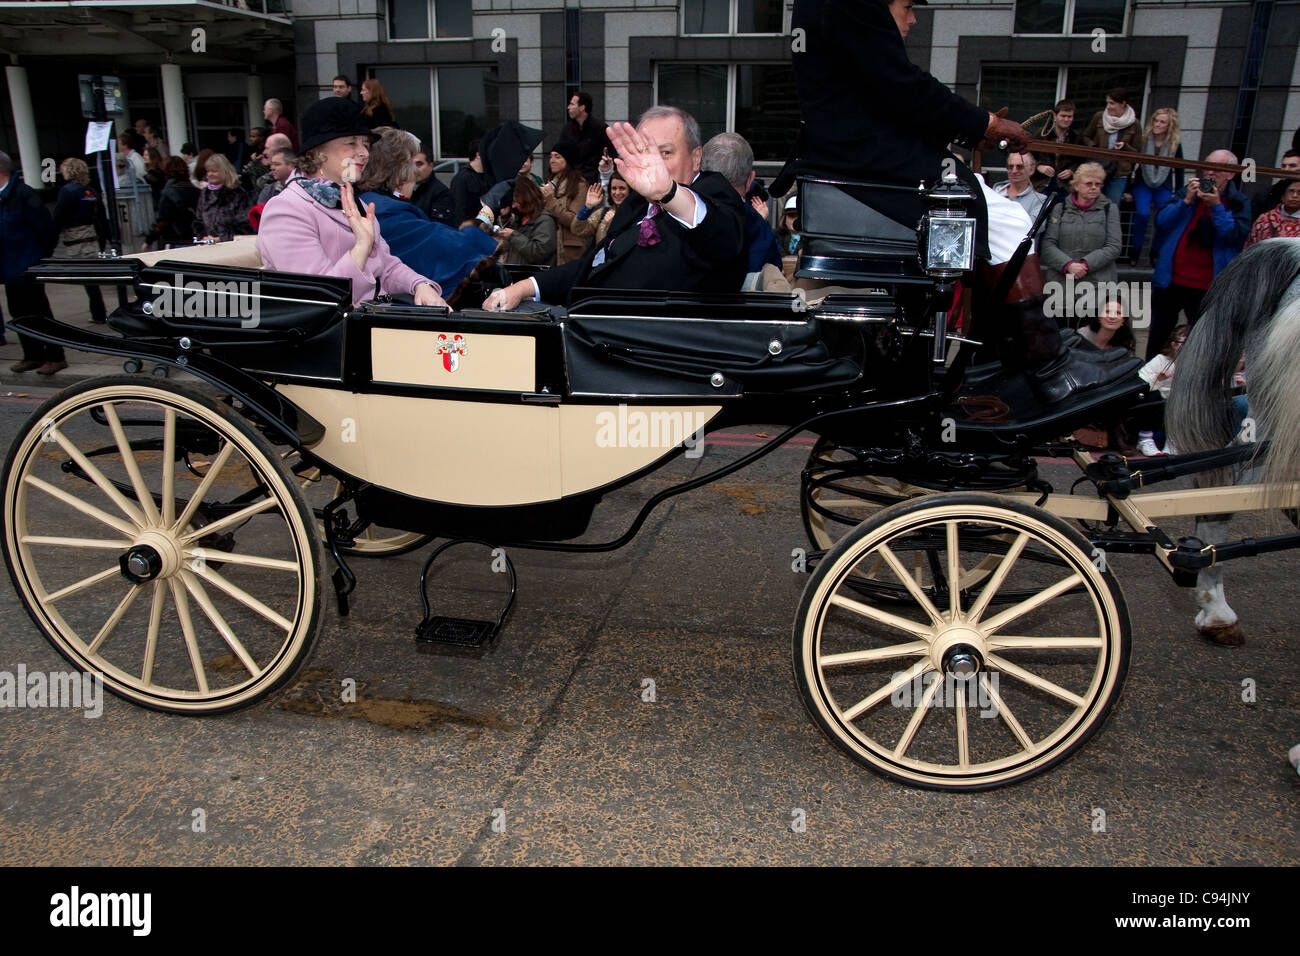 Lord's mayor show London 12th November 2011 - Stock Image